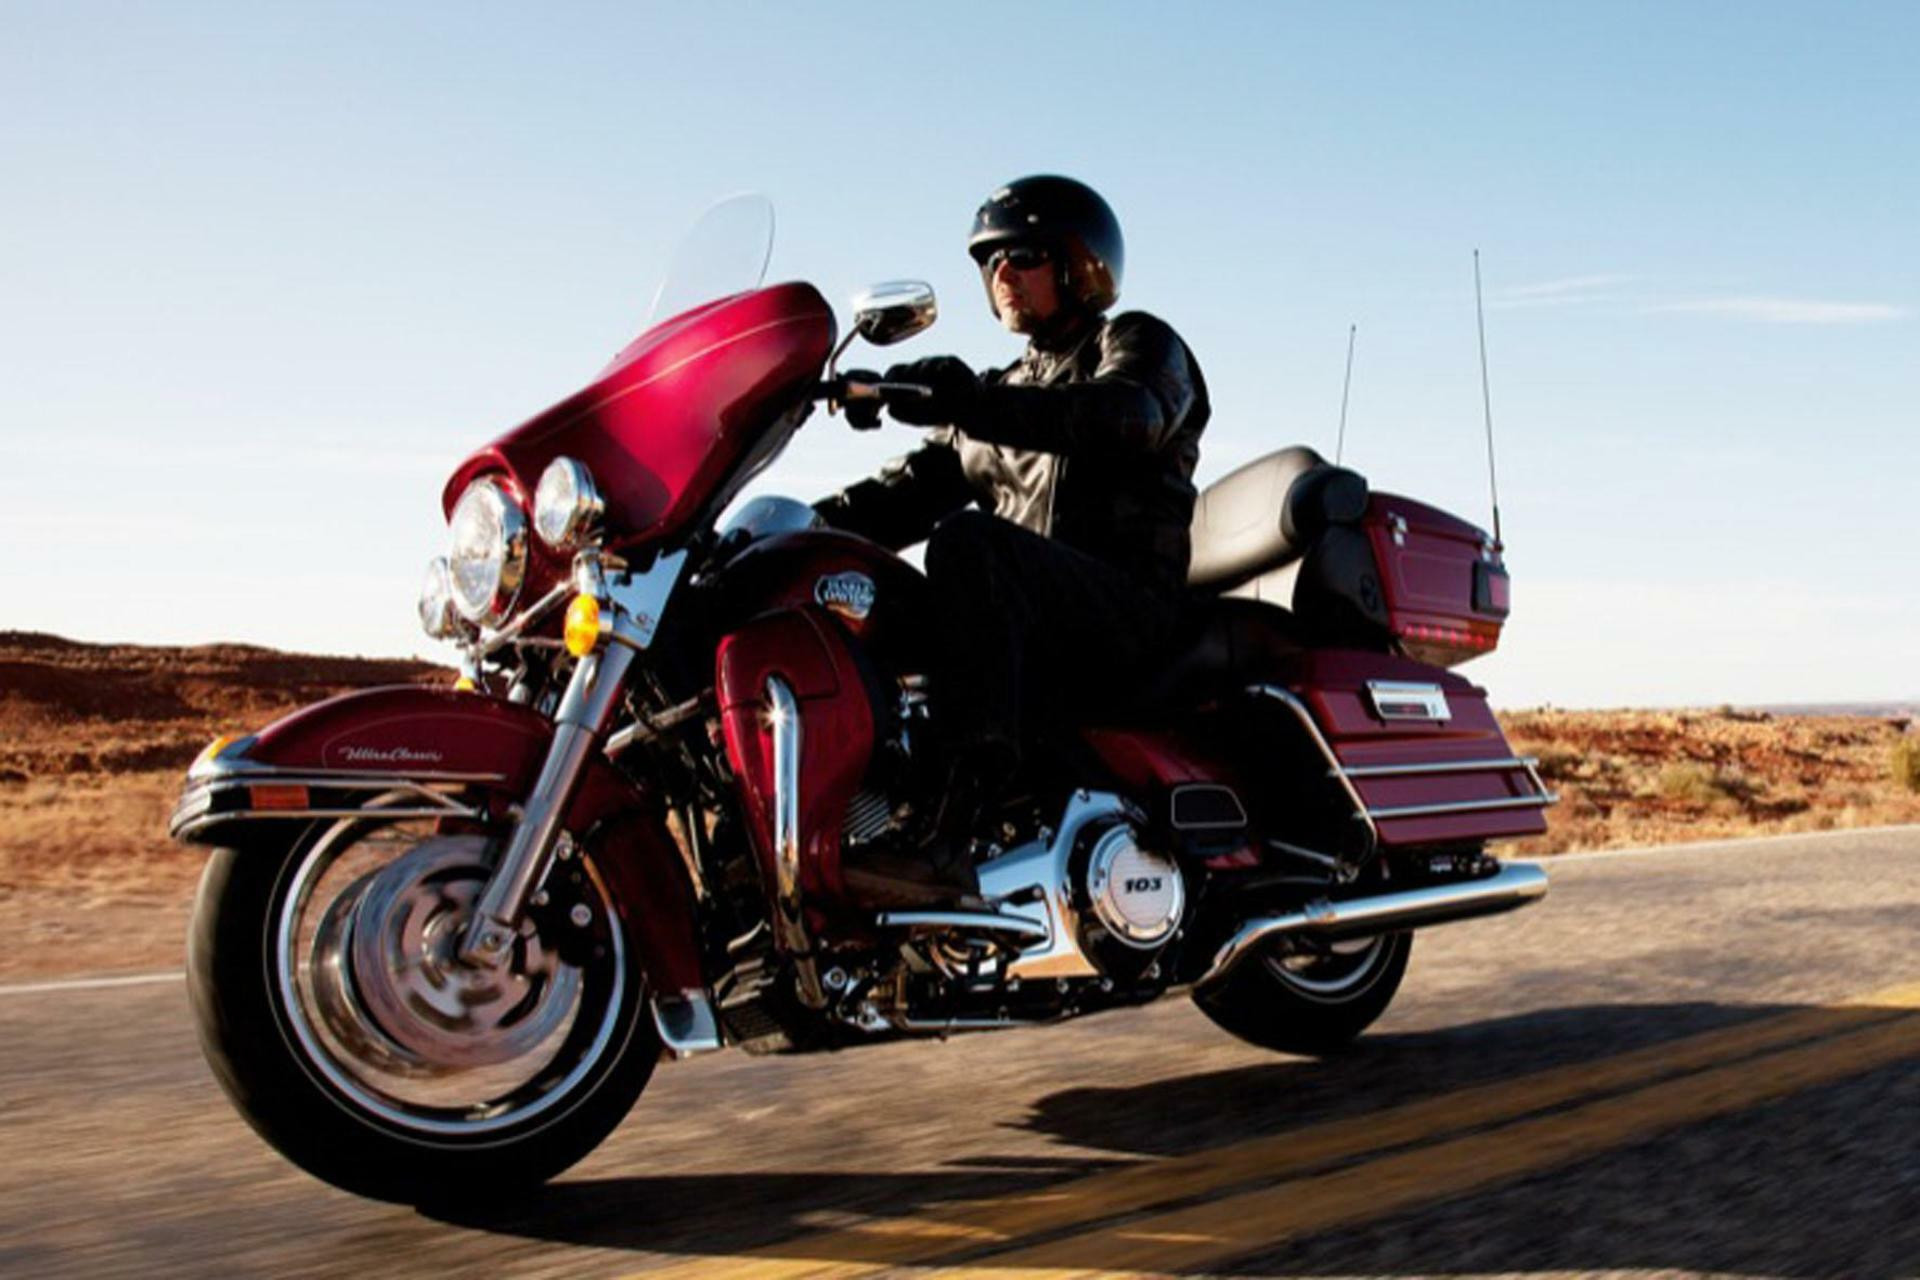 Fahrbericht Harley-Davidson FLHTCU: Lässige Eleganz